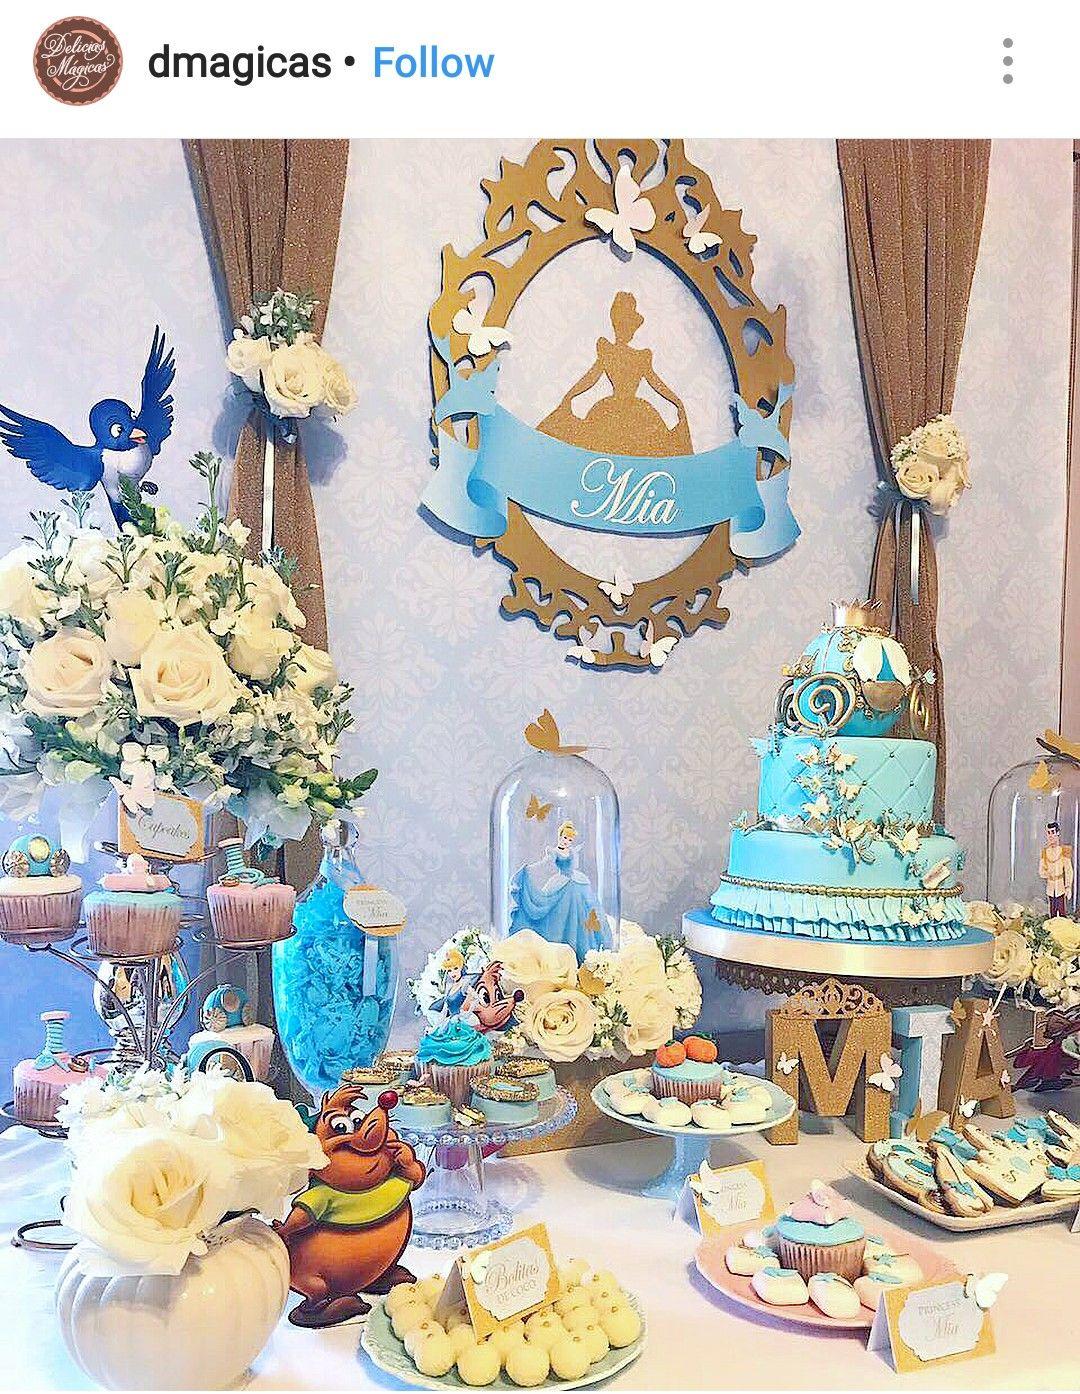 Cinderalla Birthday Party Dessert Table And Decor Cinderella Party Decorations Cinderella Quinceanera Themes Cinderella Birthday